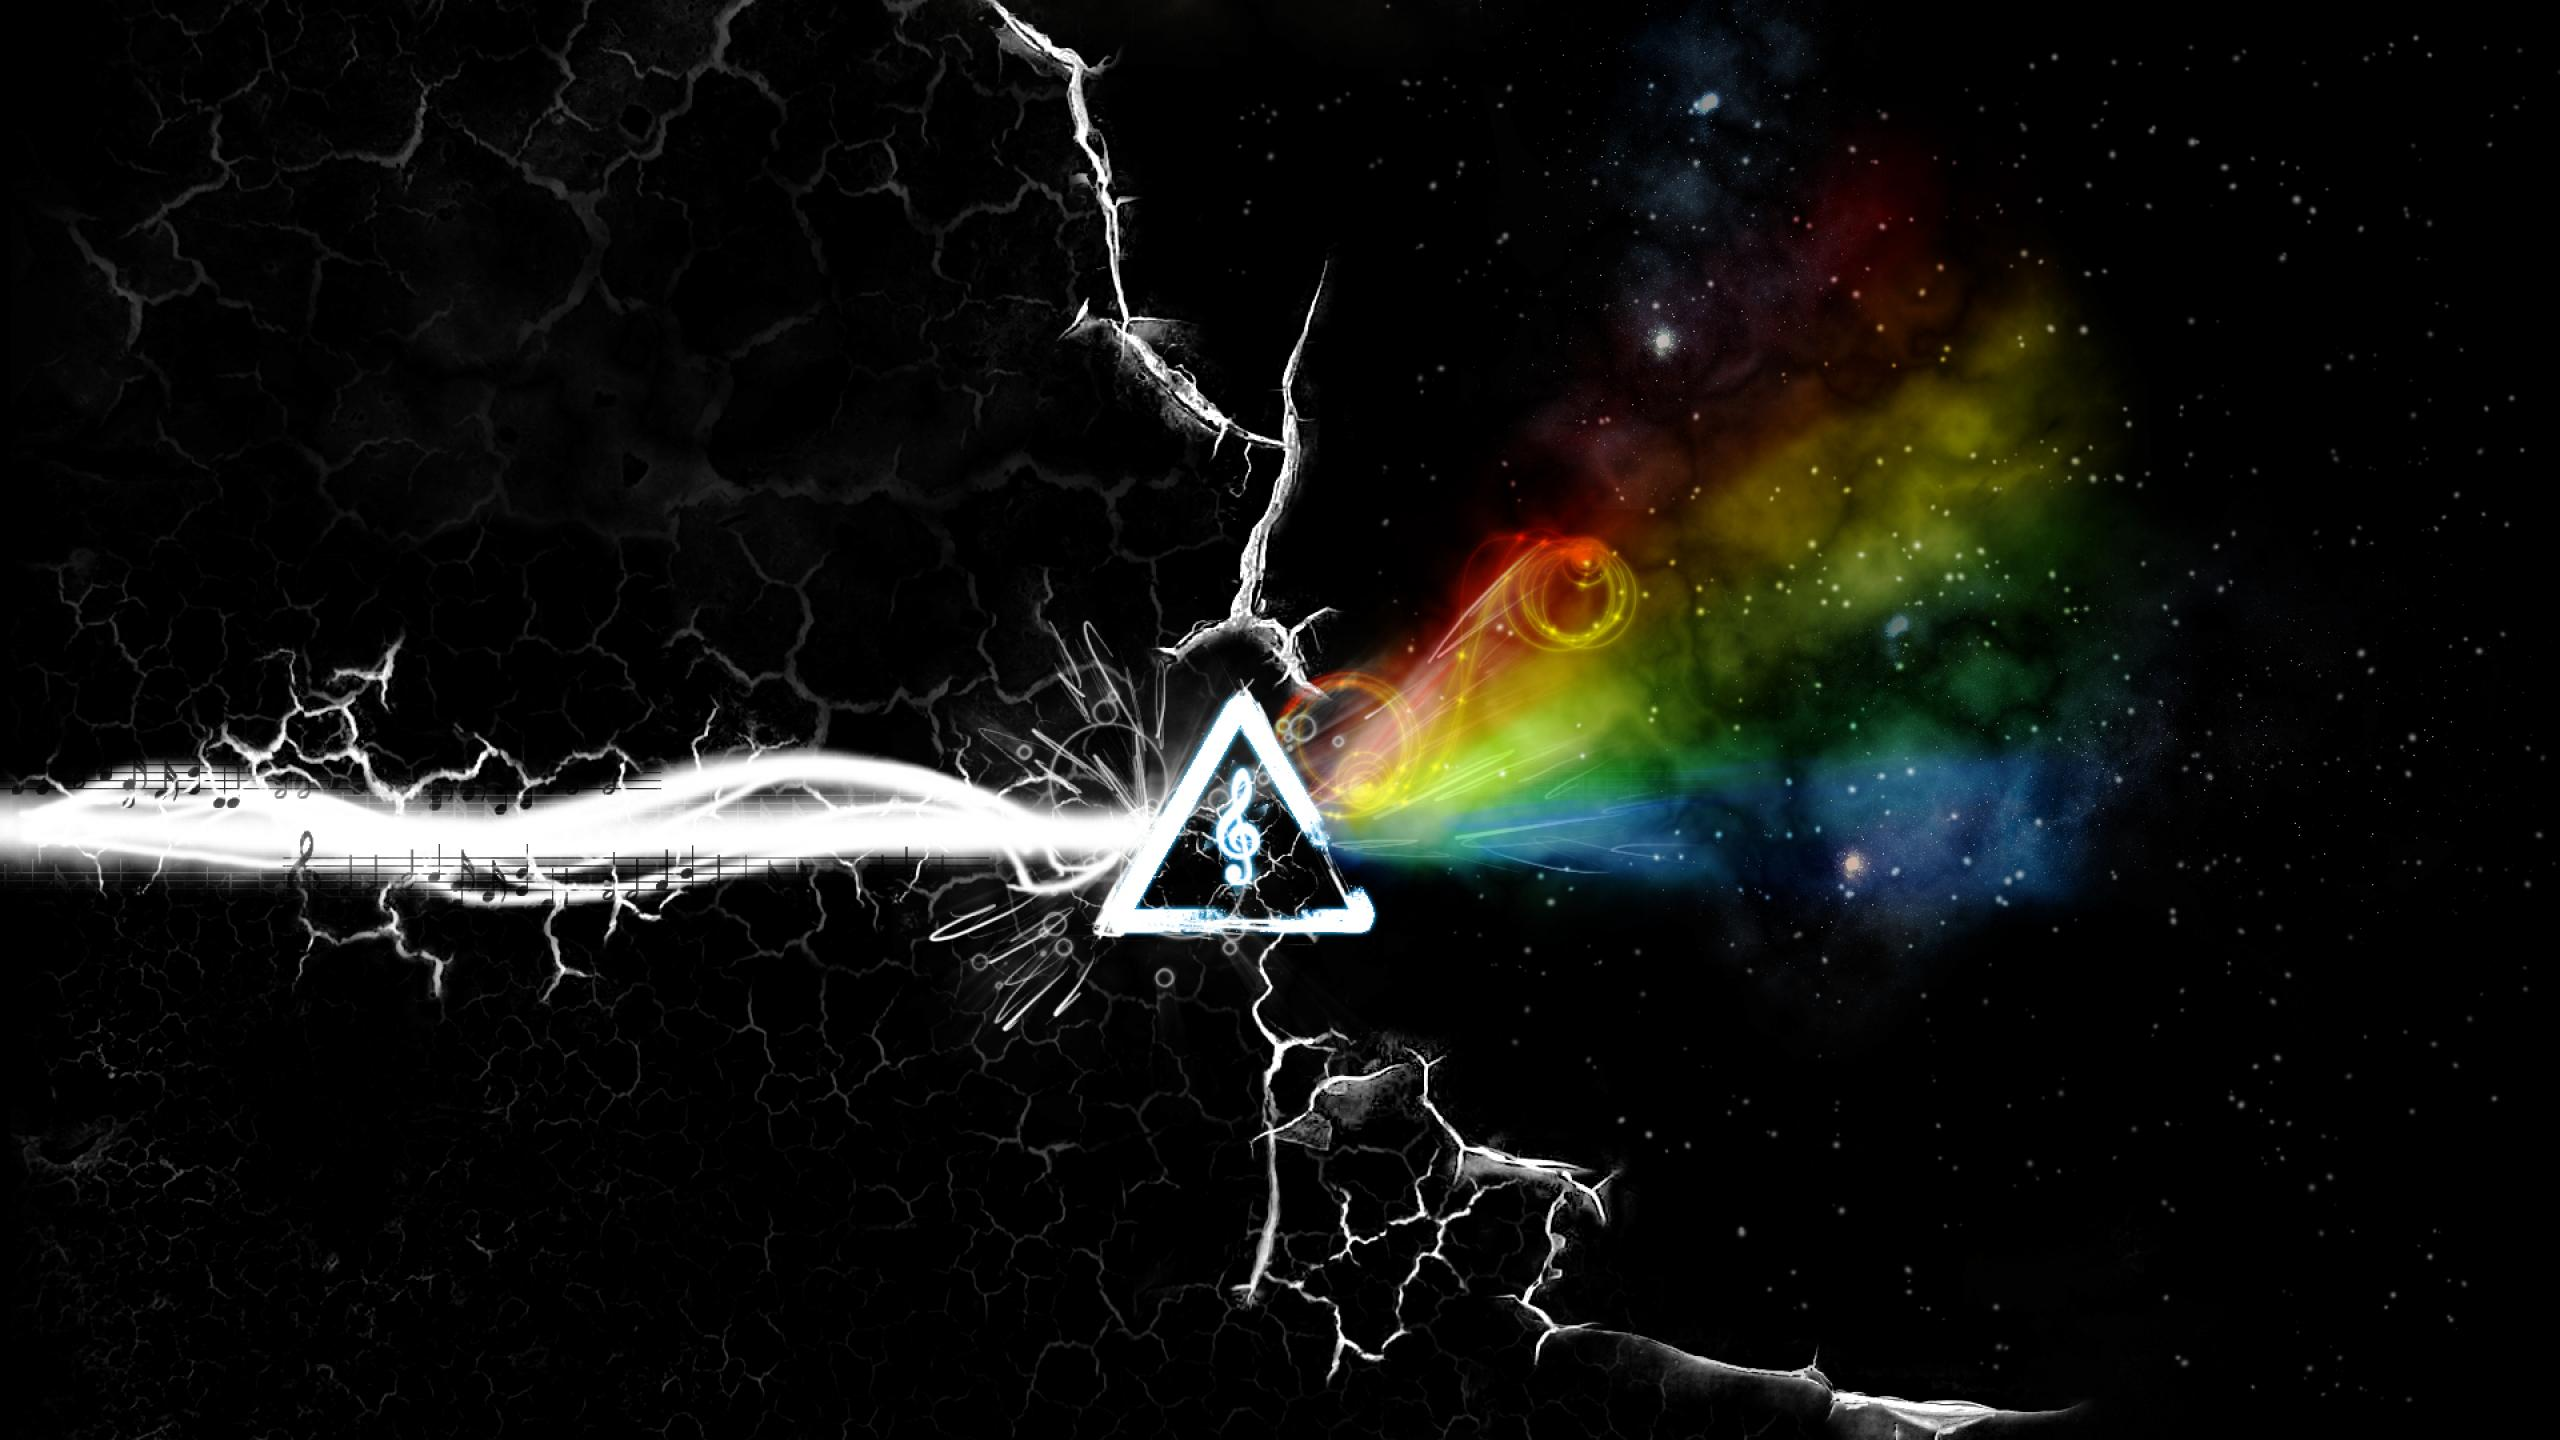 HD Pink Floyd Wallpapers 2560x1440